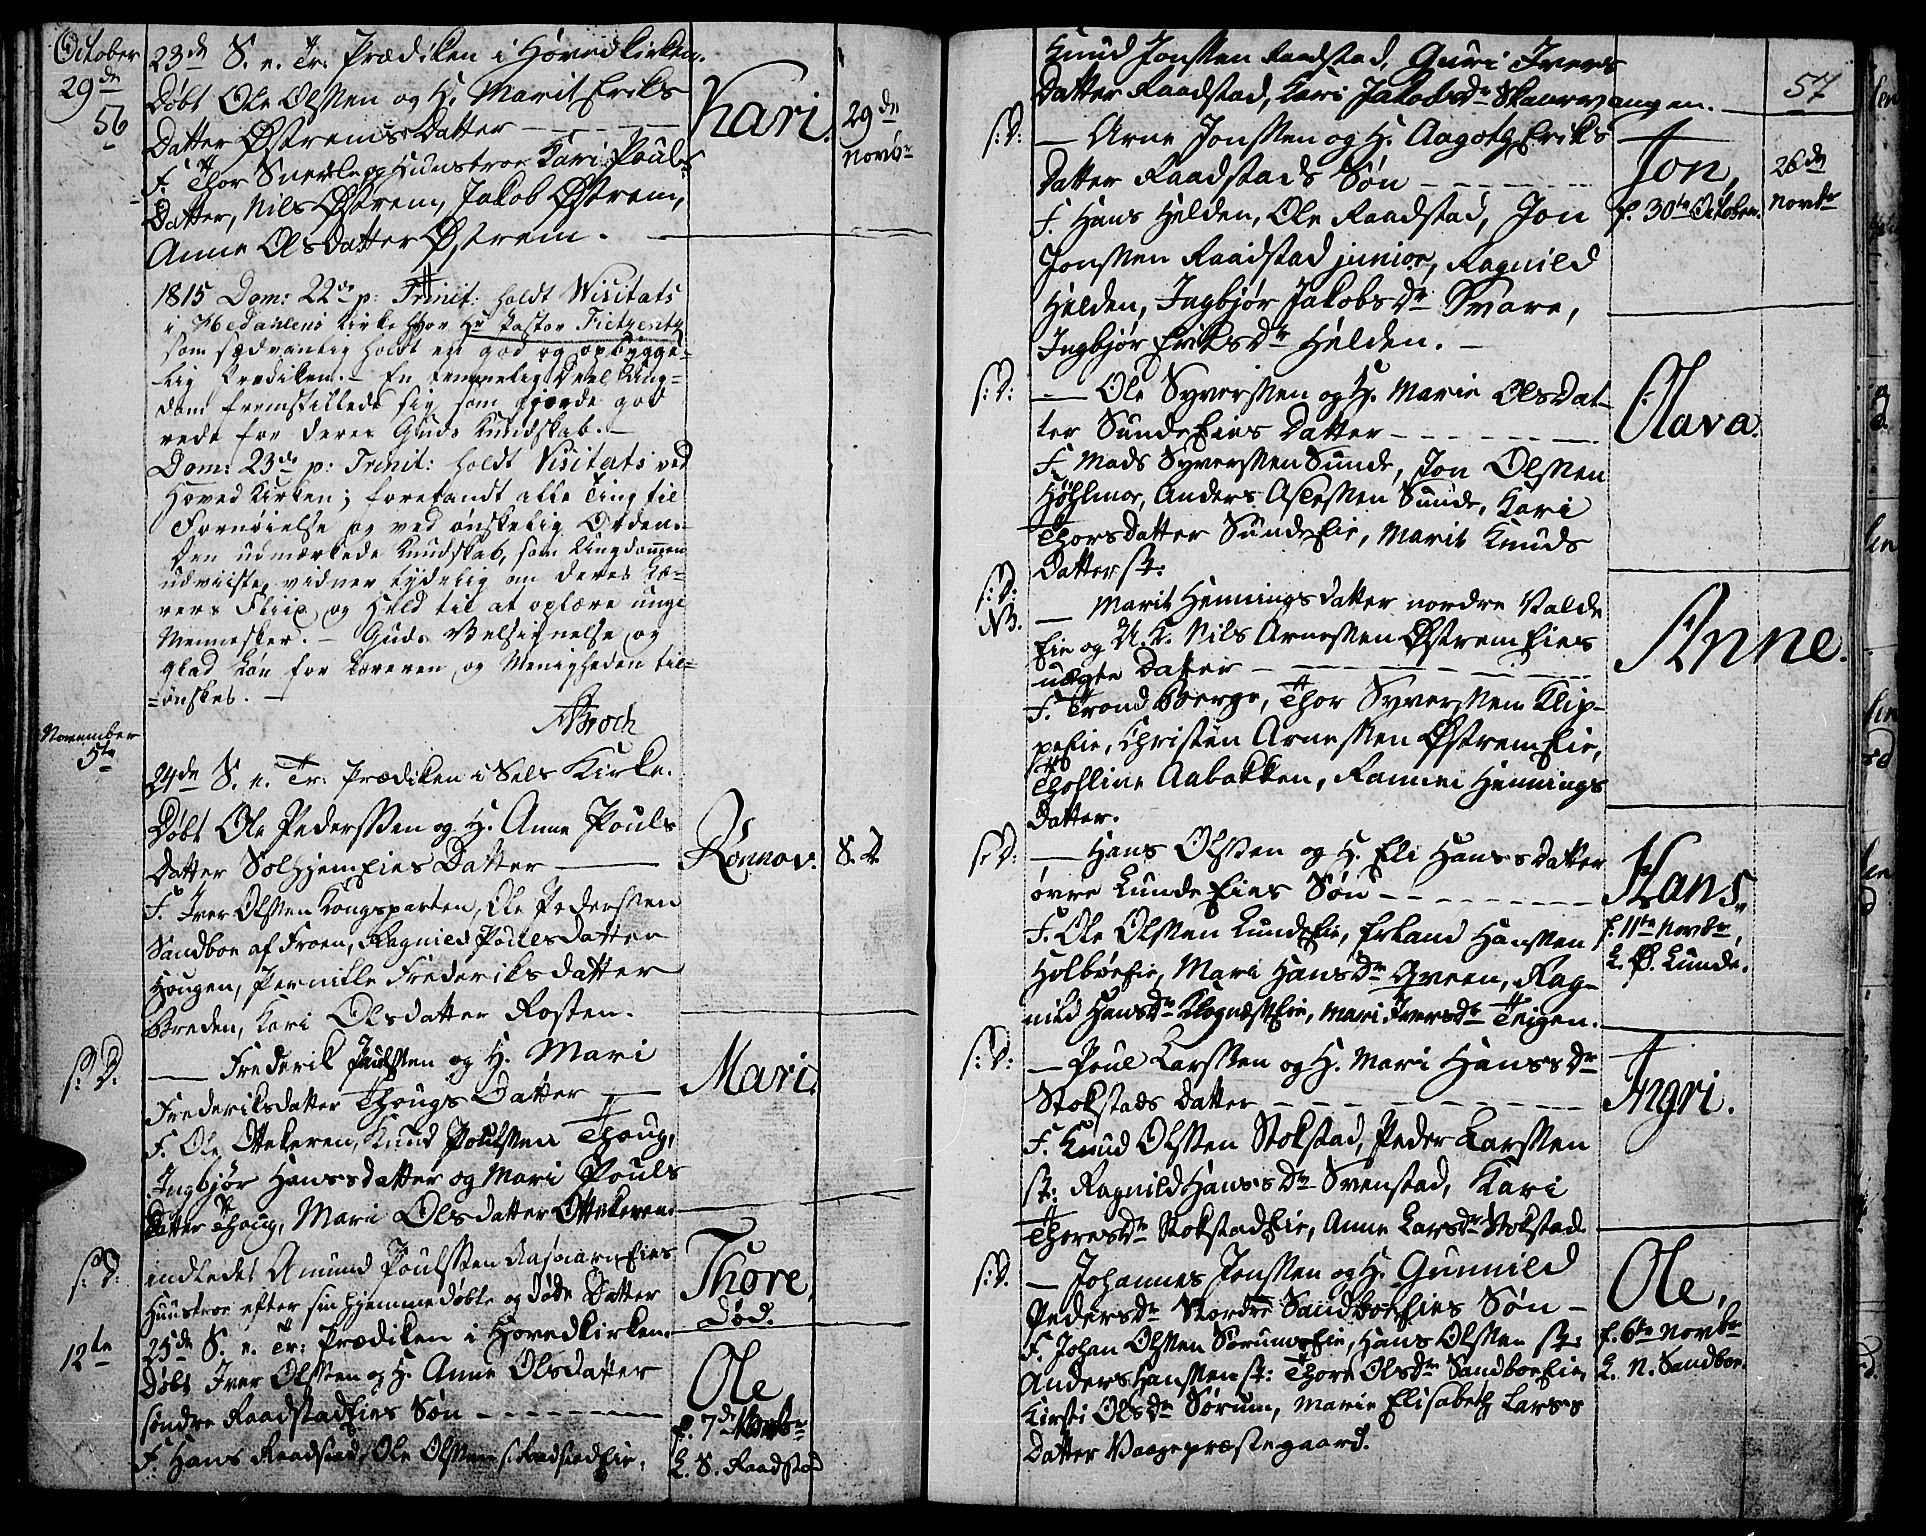 SAH, Vågå prestekontor, Ministerialbok nr. 2, 1810-1815, s. 56-57